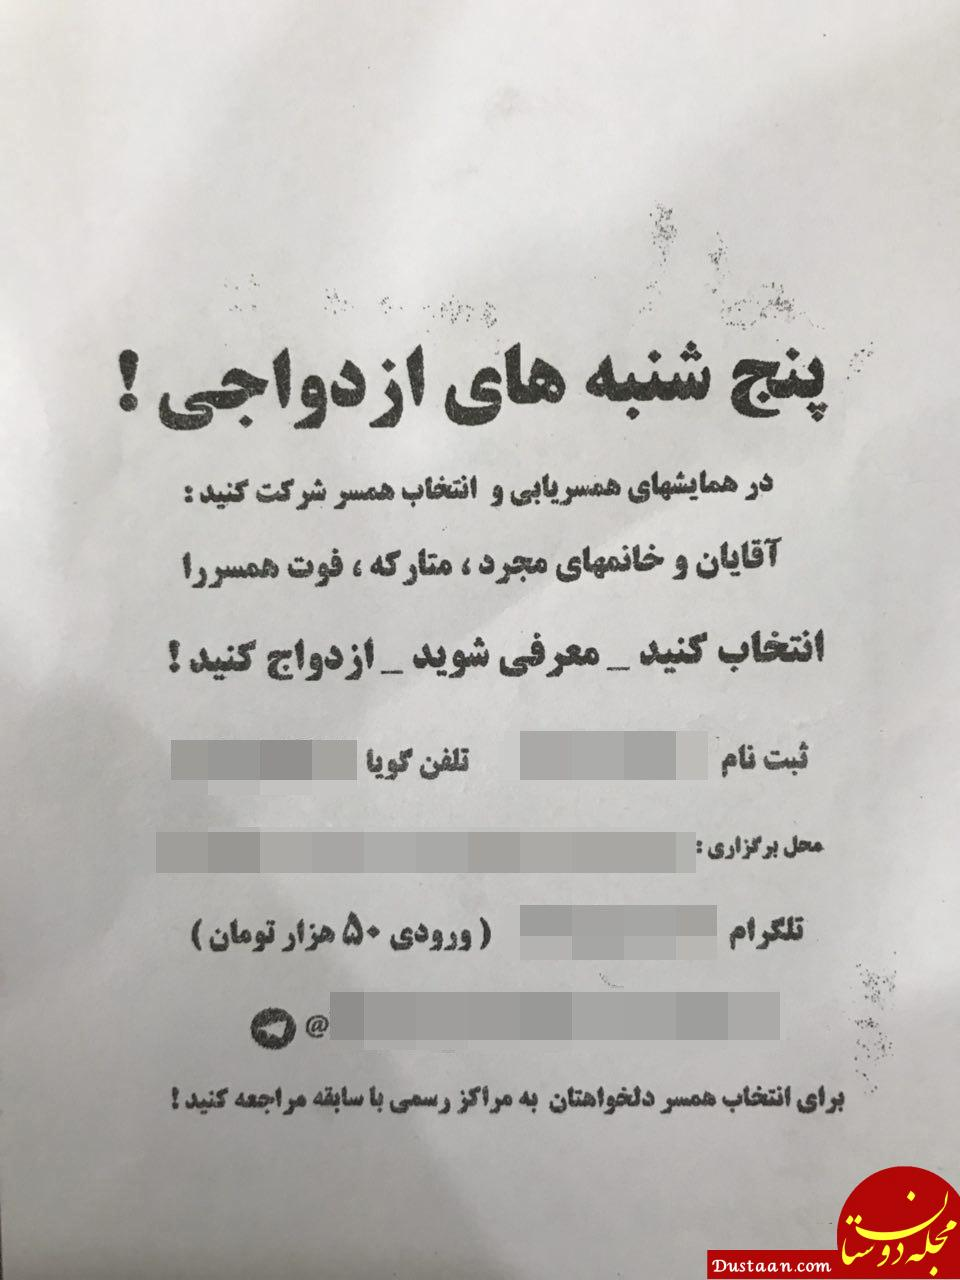 www.dustaan.com دعوت از مجردها به «پنج شنبه های ازدواجی»! +عکس